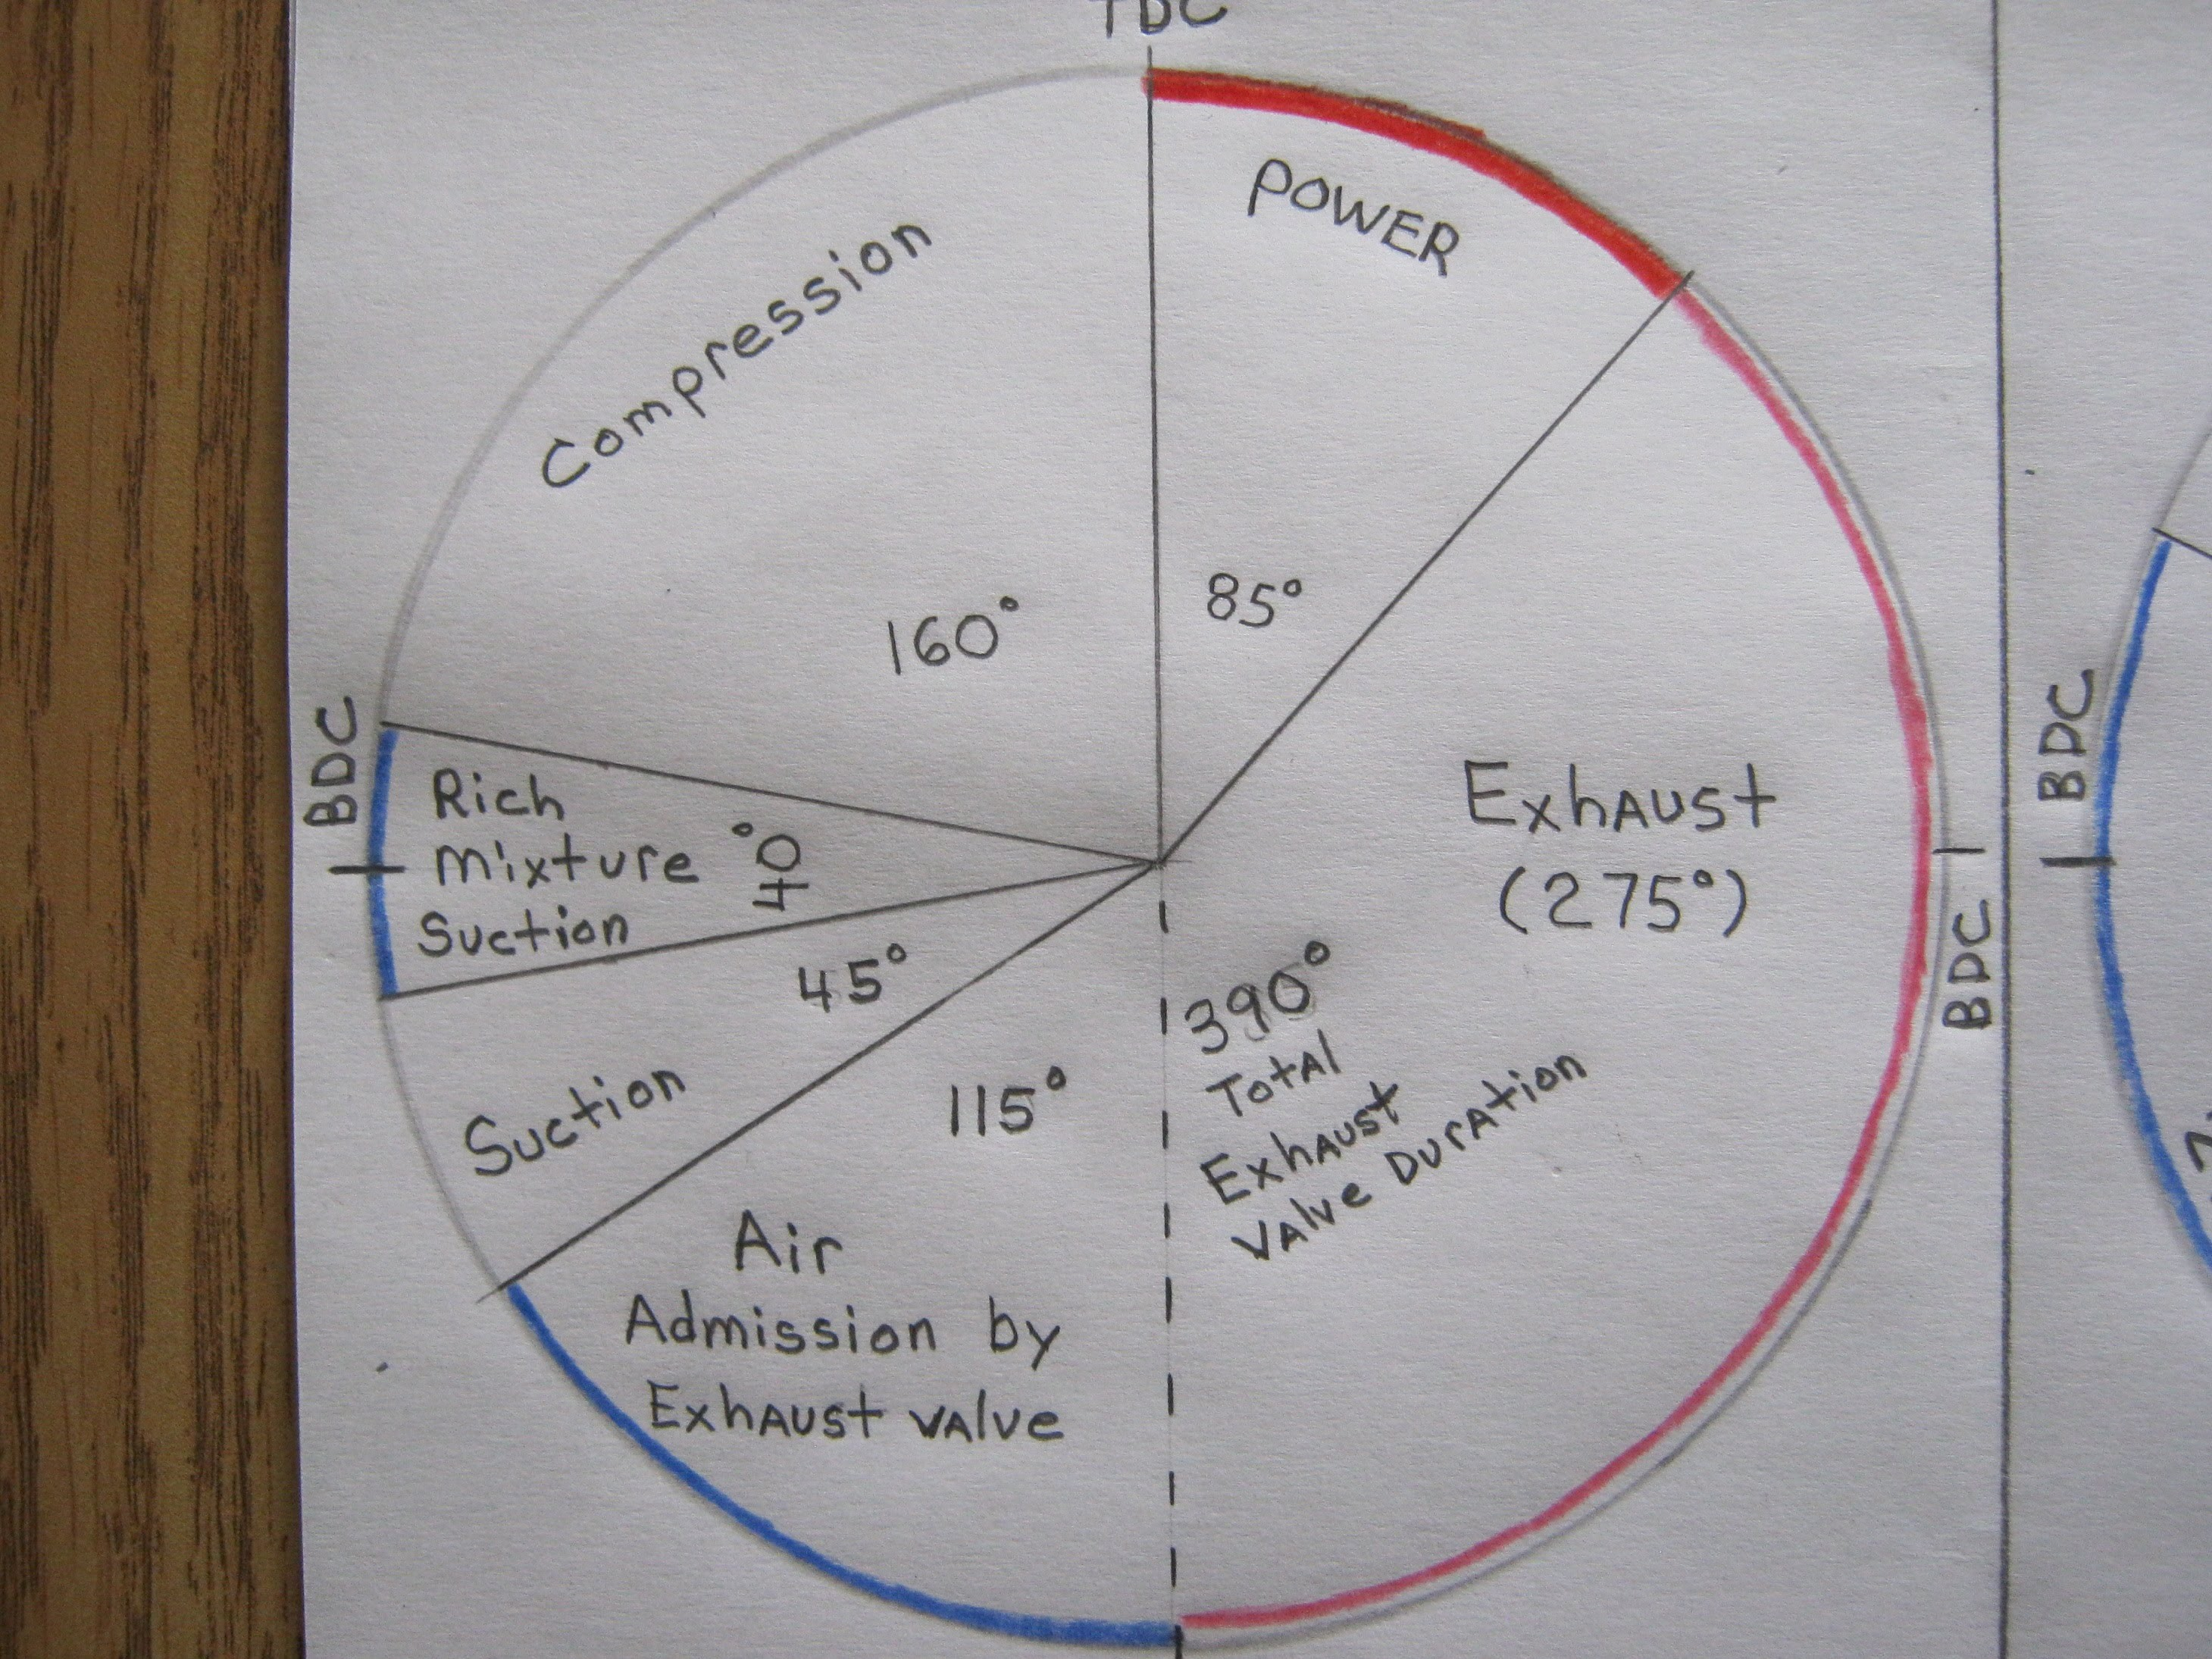 v8 engine valve timing diagram example electrical wiring diagram u2022 rh huntervalleyhotels co Kia Parts Diagram Kia Sedona Parts Diagram